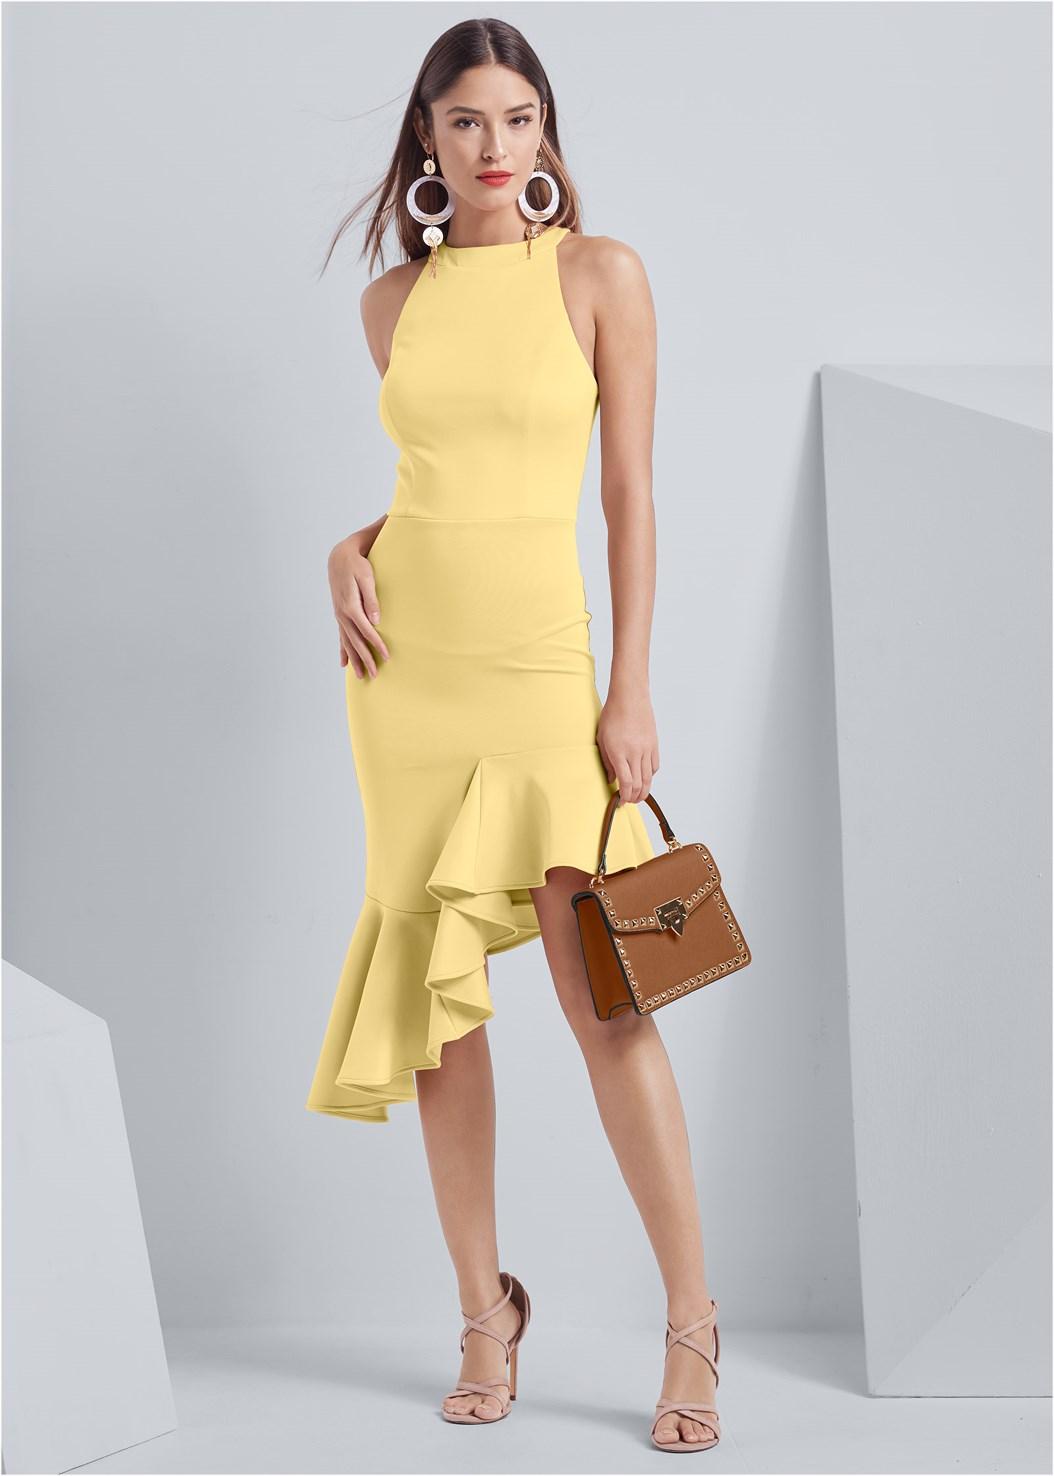 Ruffle Hem Dress,Bralette And Panty Set,Strappy Heels,Oversized Tassel Earrings,Stud Detail Handbag